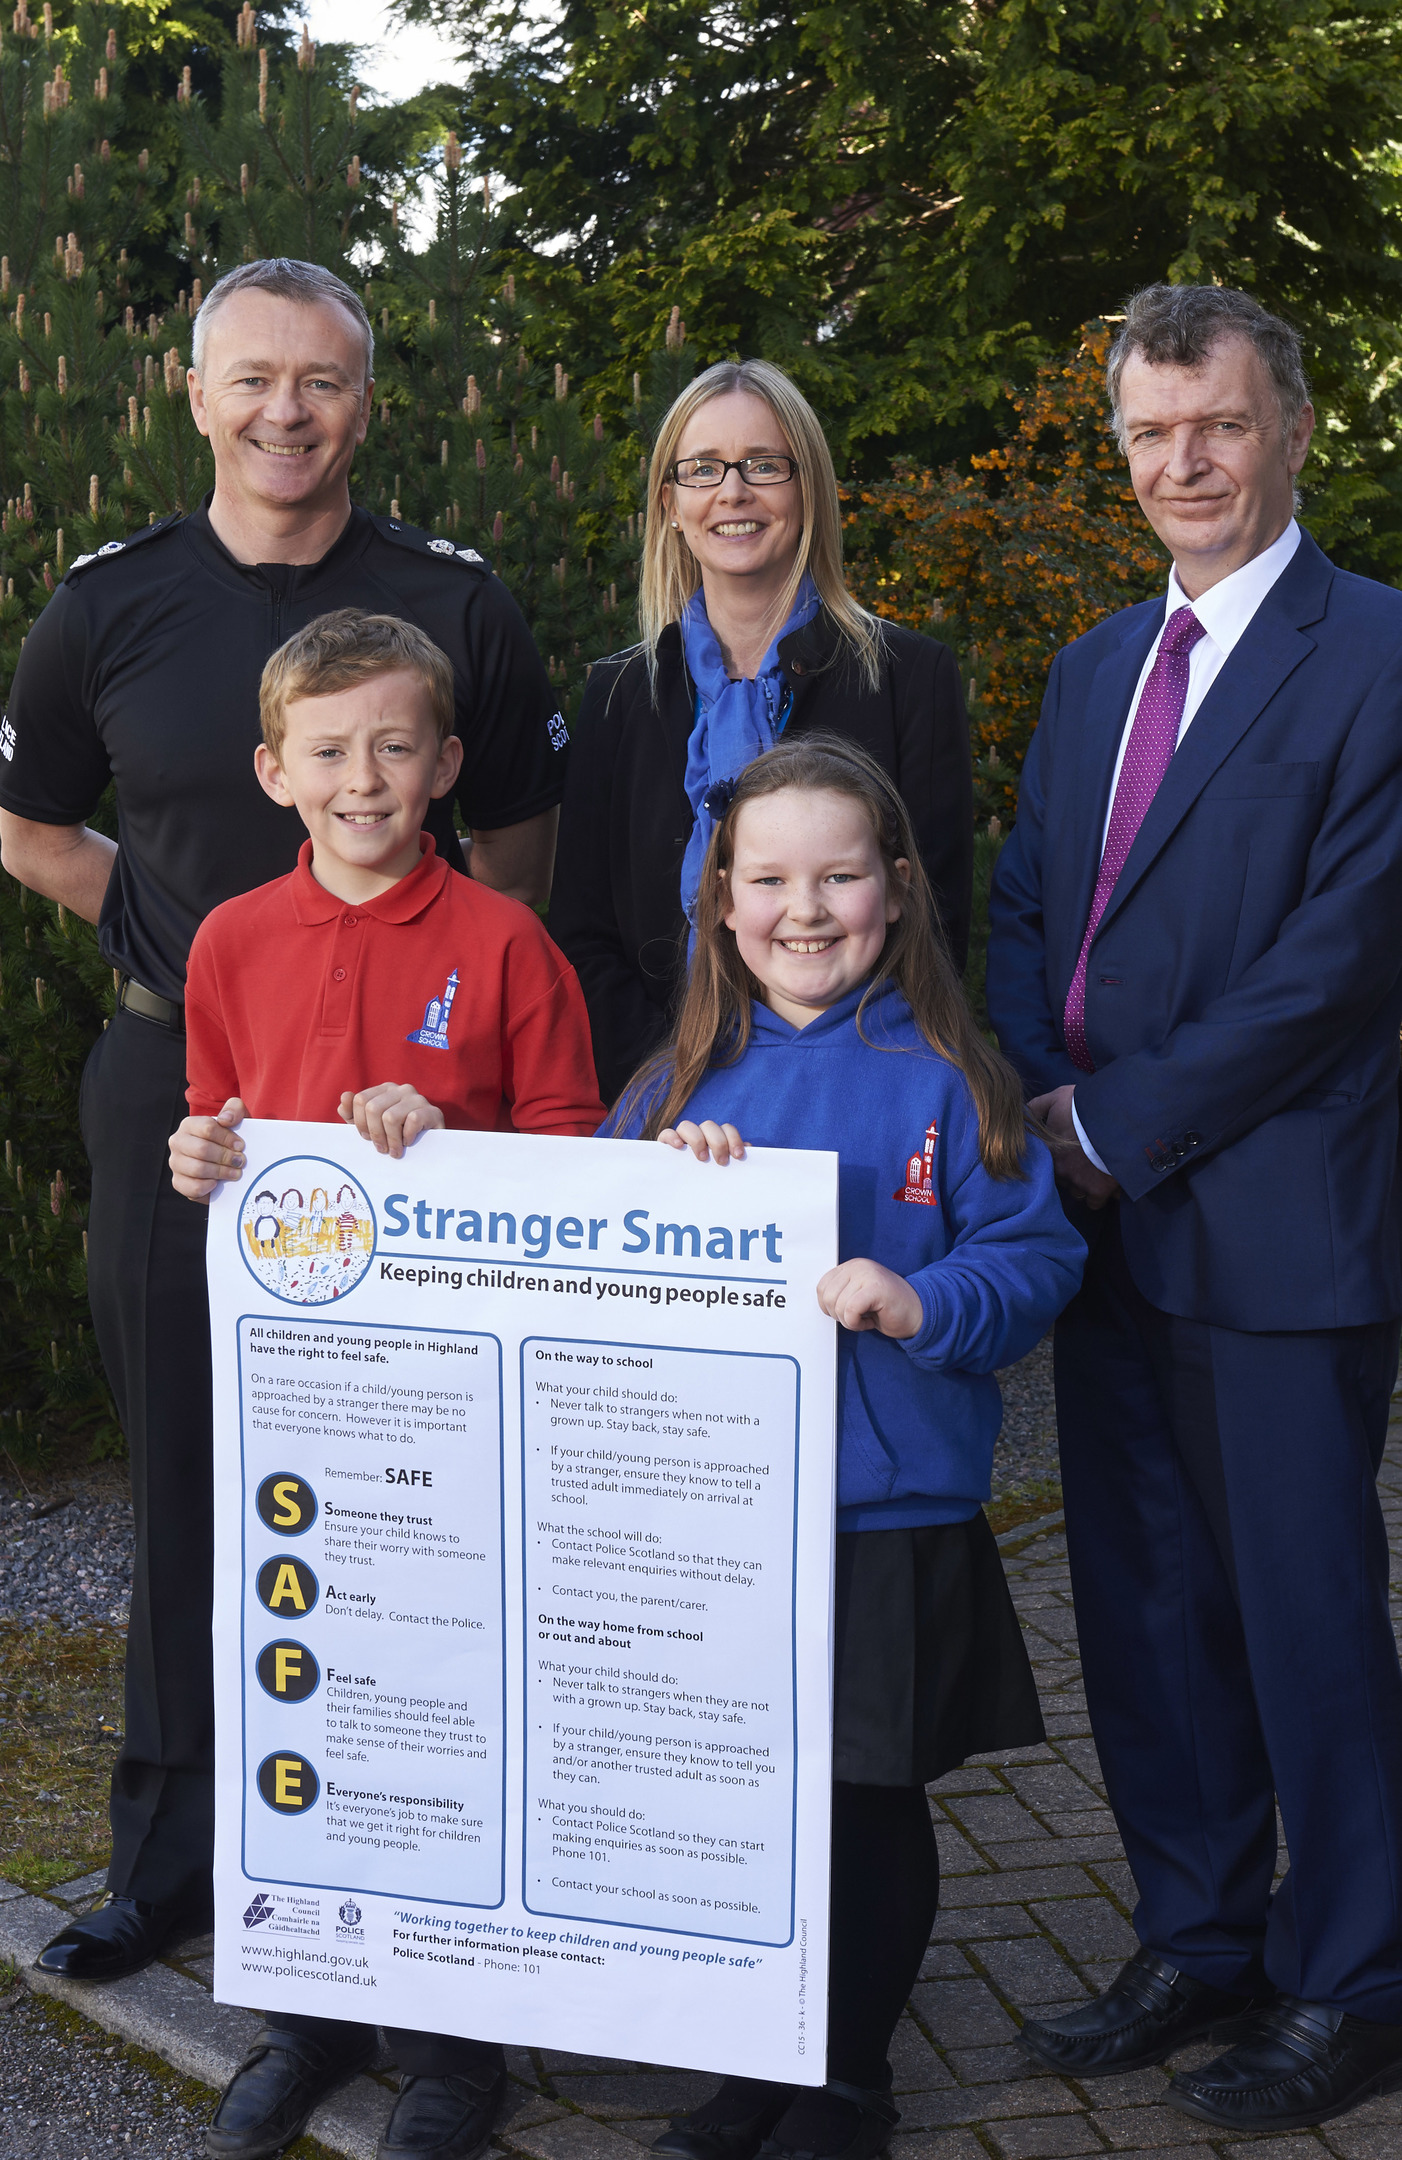 Stranger smart launch, Highland Council 20/5/15